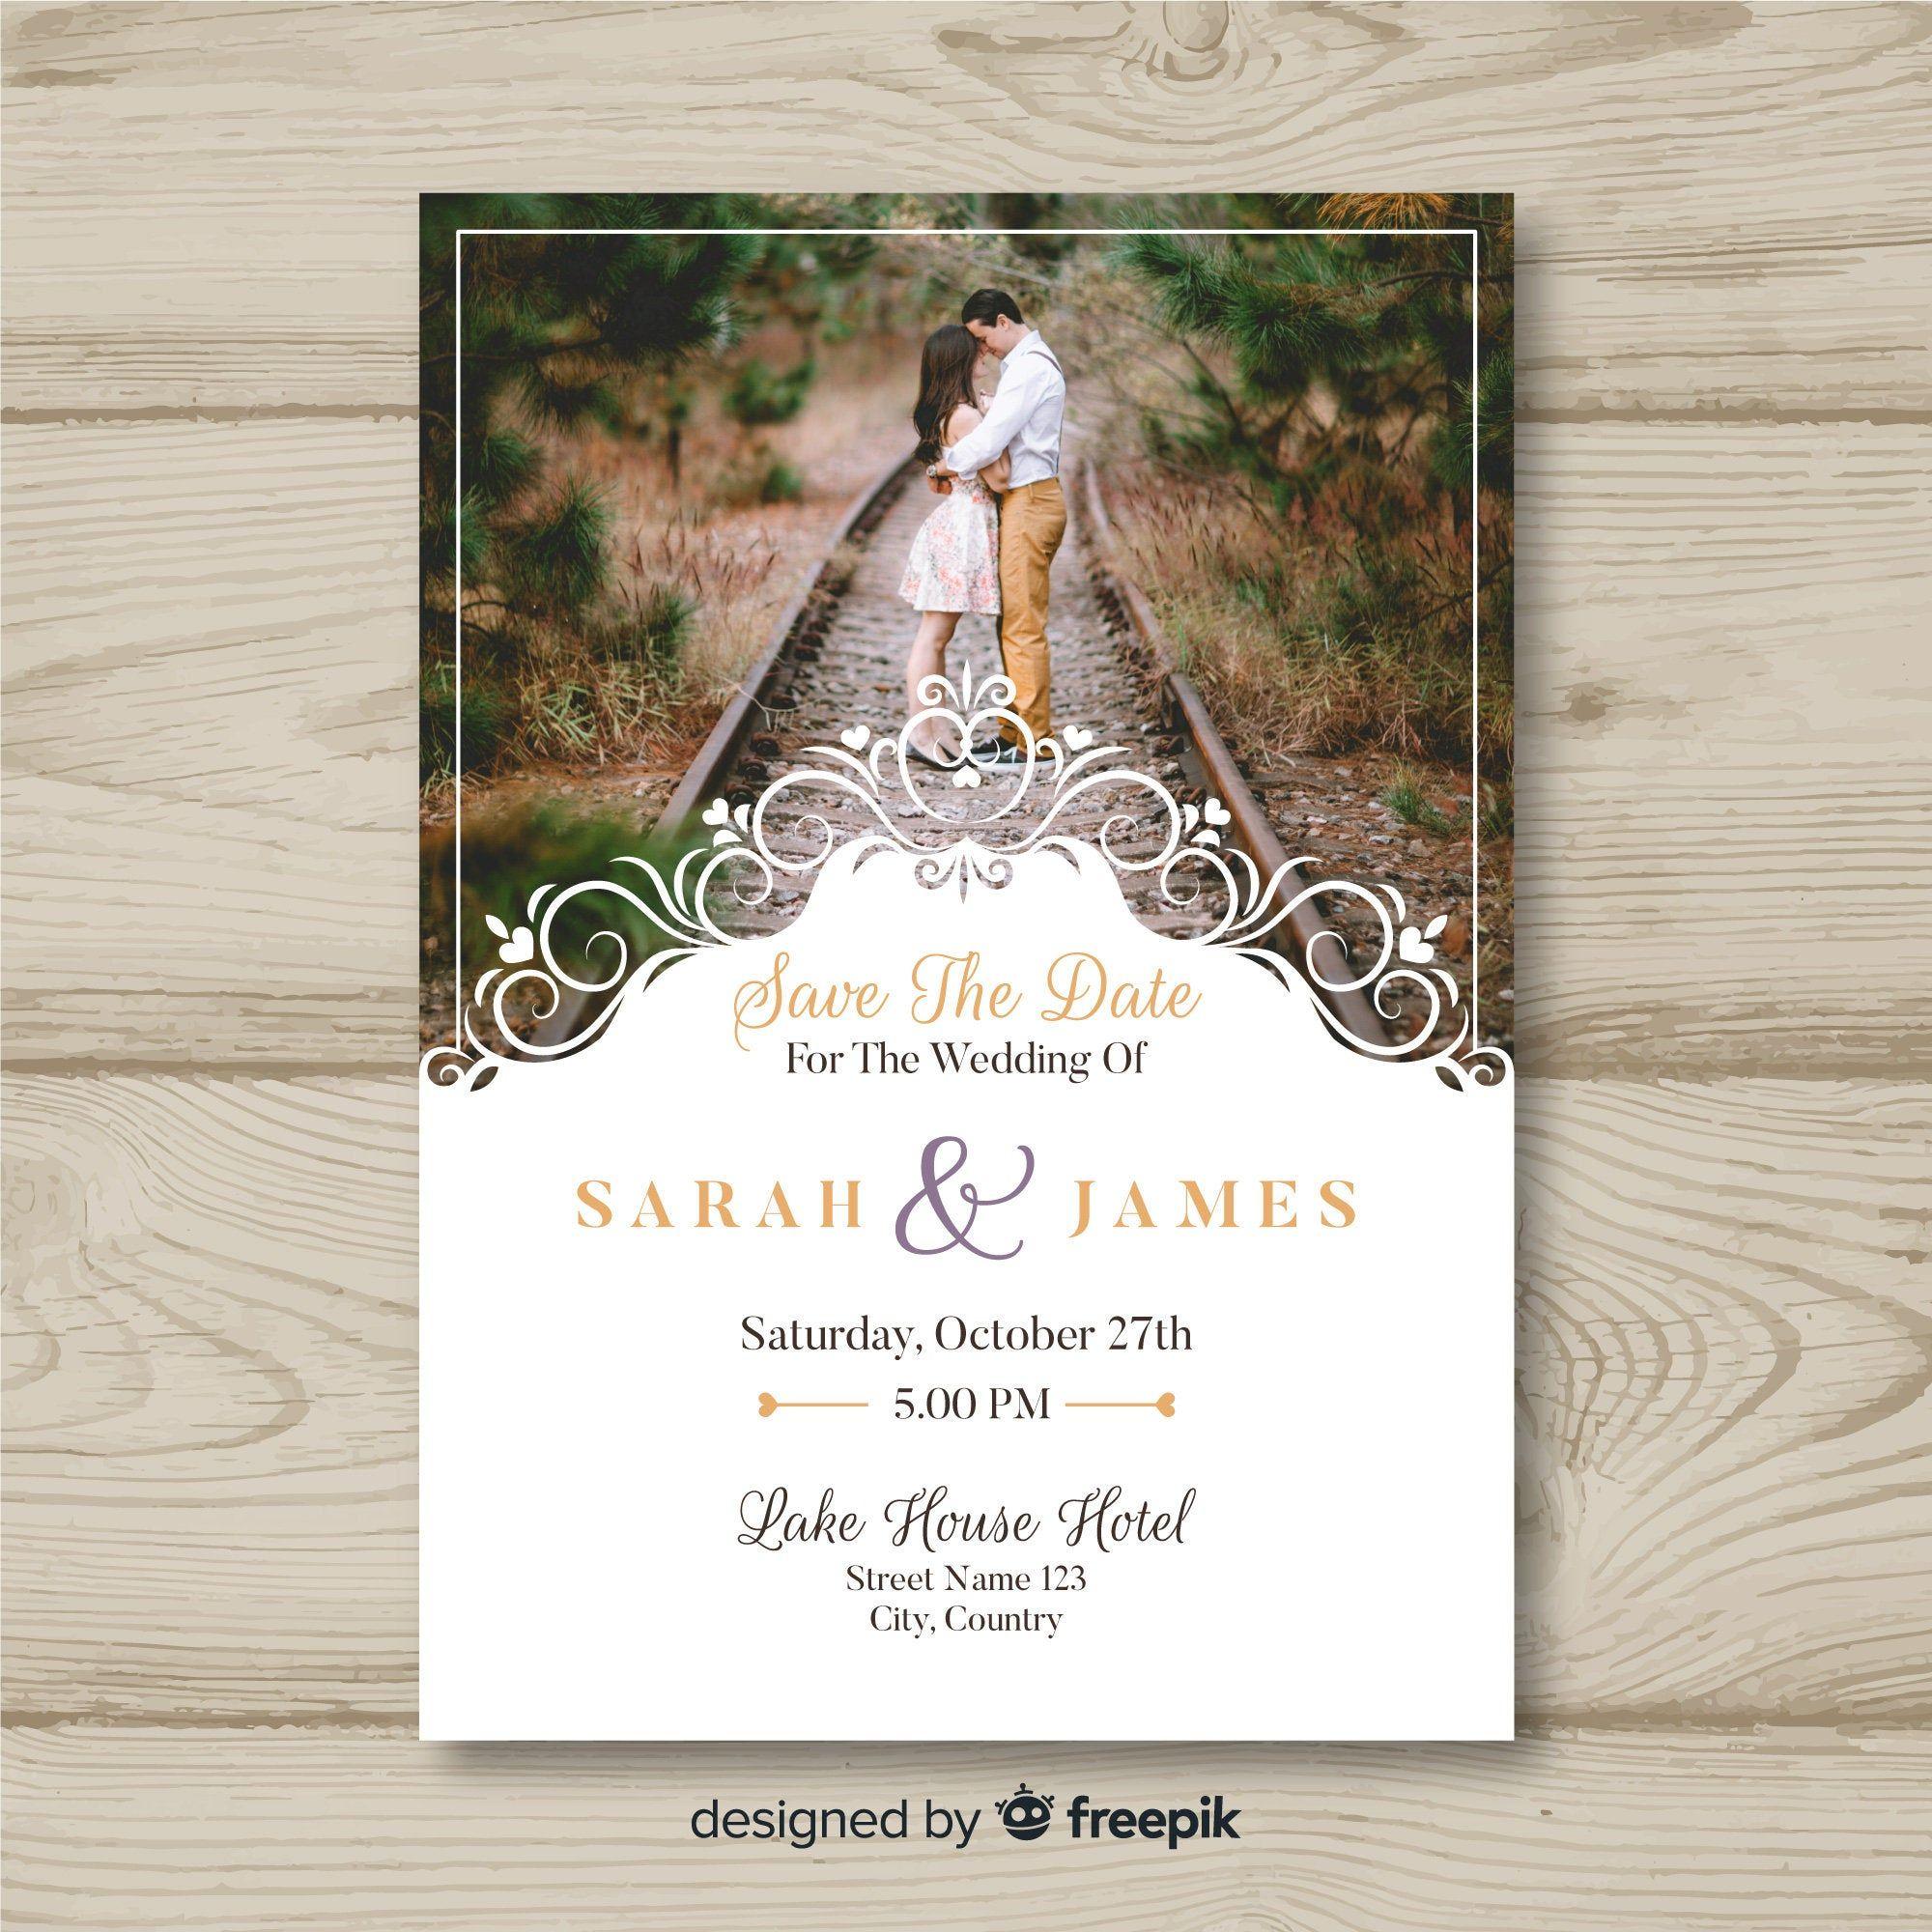 Elegant Wedding Invitation Card Template Eps Illustrator File Vintage Edi Di 2021 Kartu Undangan Pernikahan Desain Kartu Undangan Undangan Pernikahan